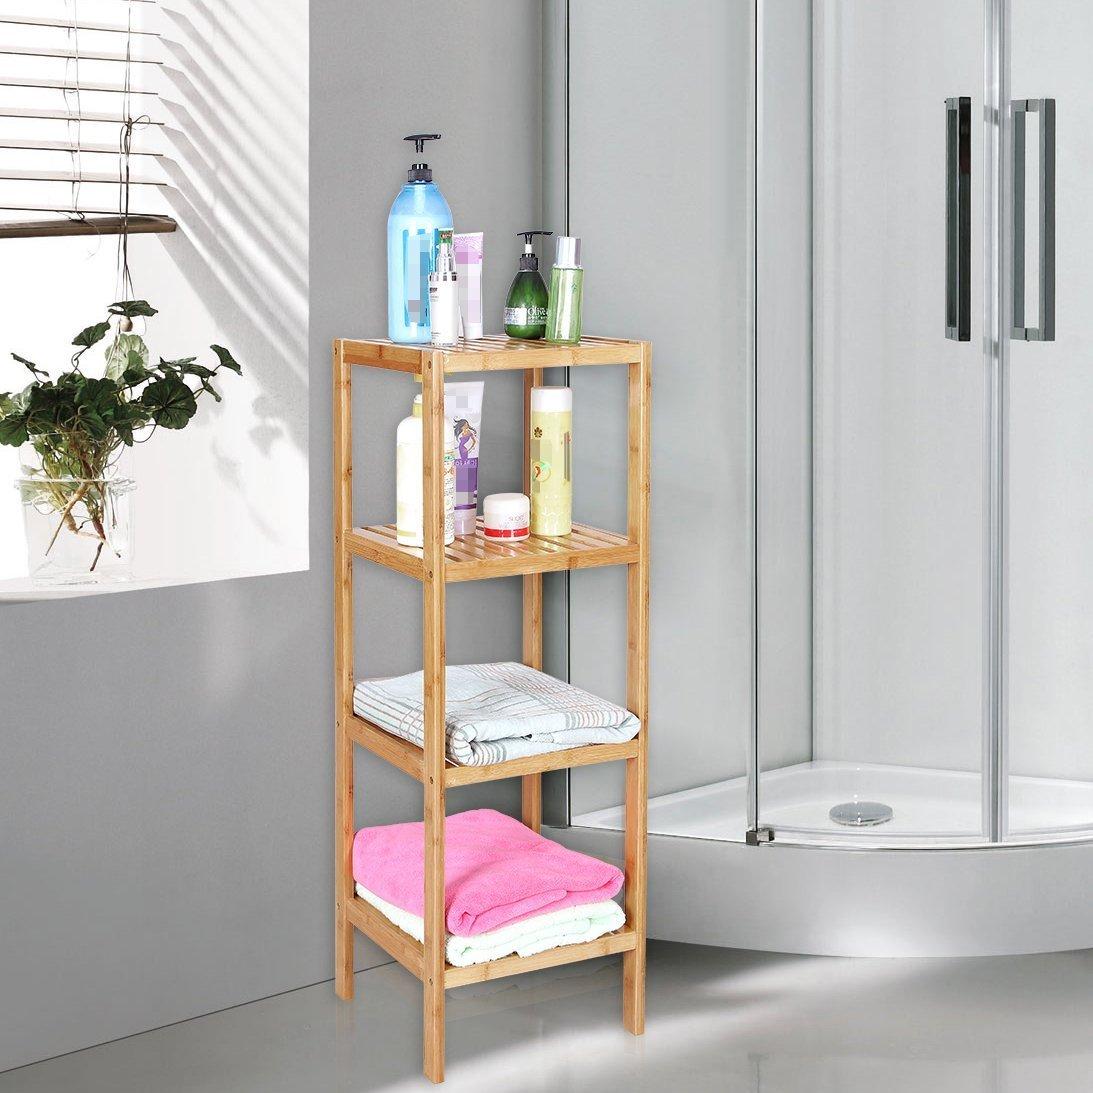 4 Tier Shelf Bamboo Corner Tower Rack Bathroom Storage Space Saving ...